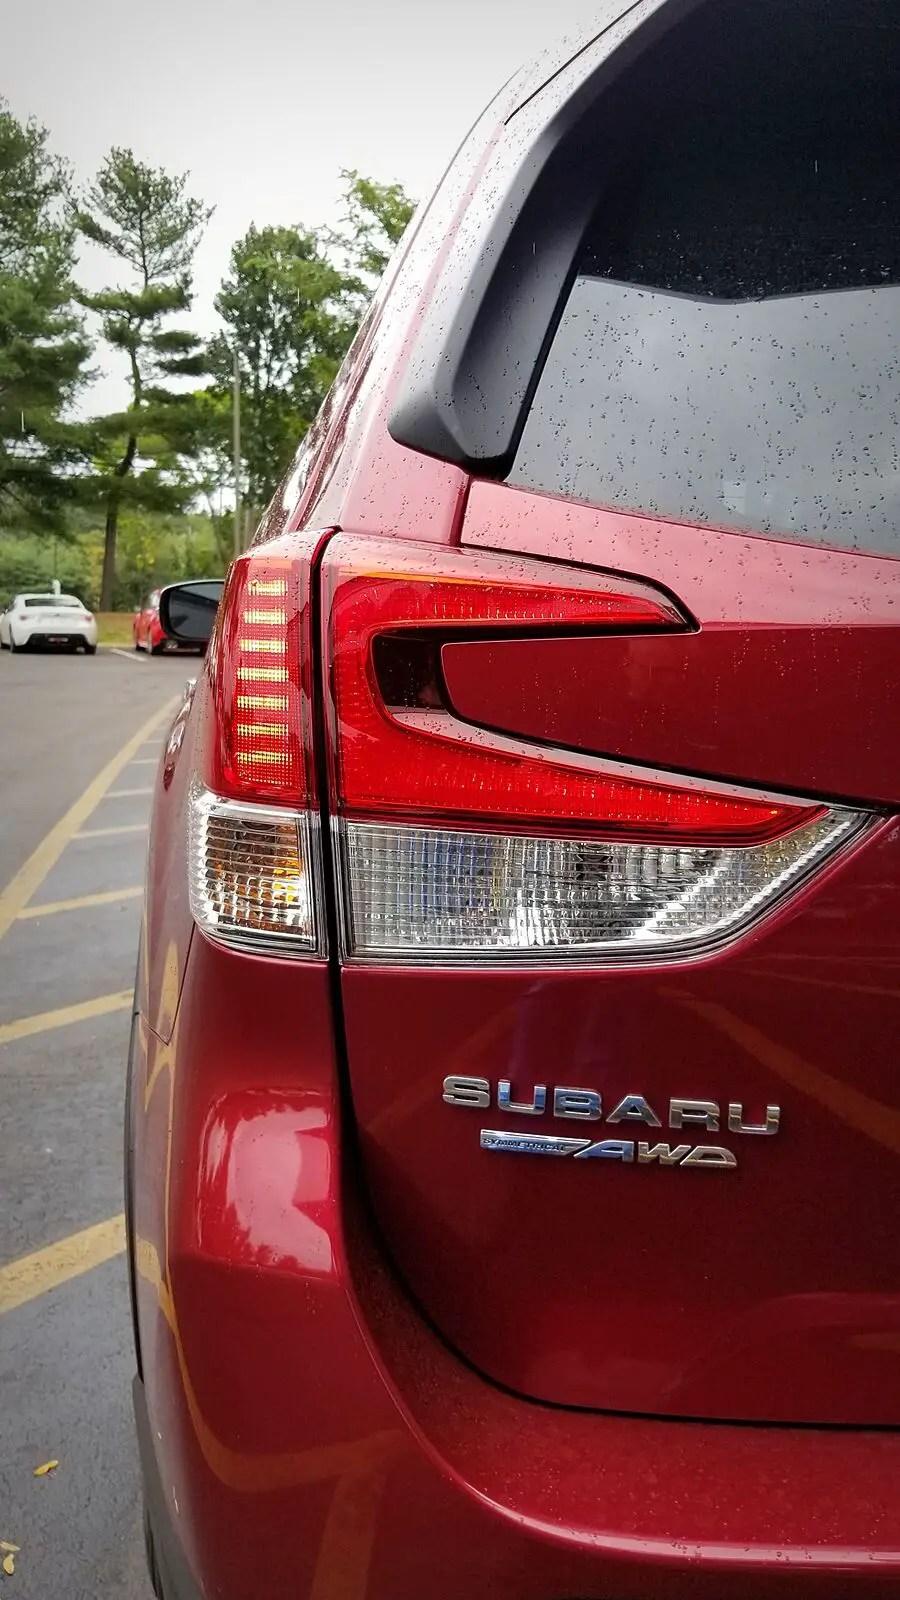 2021 Subaru Forester Rear Angel Changes